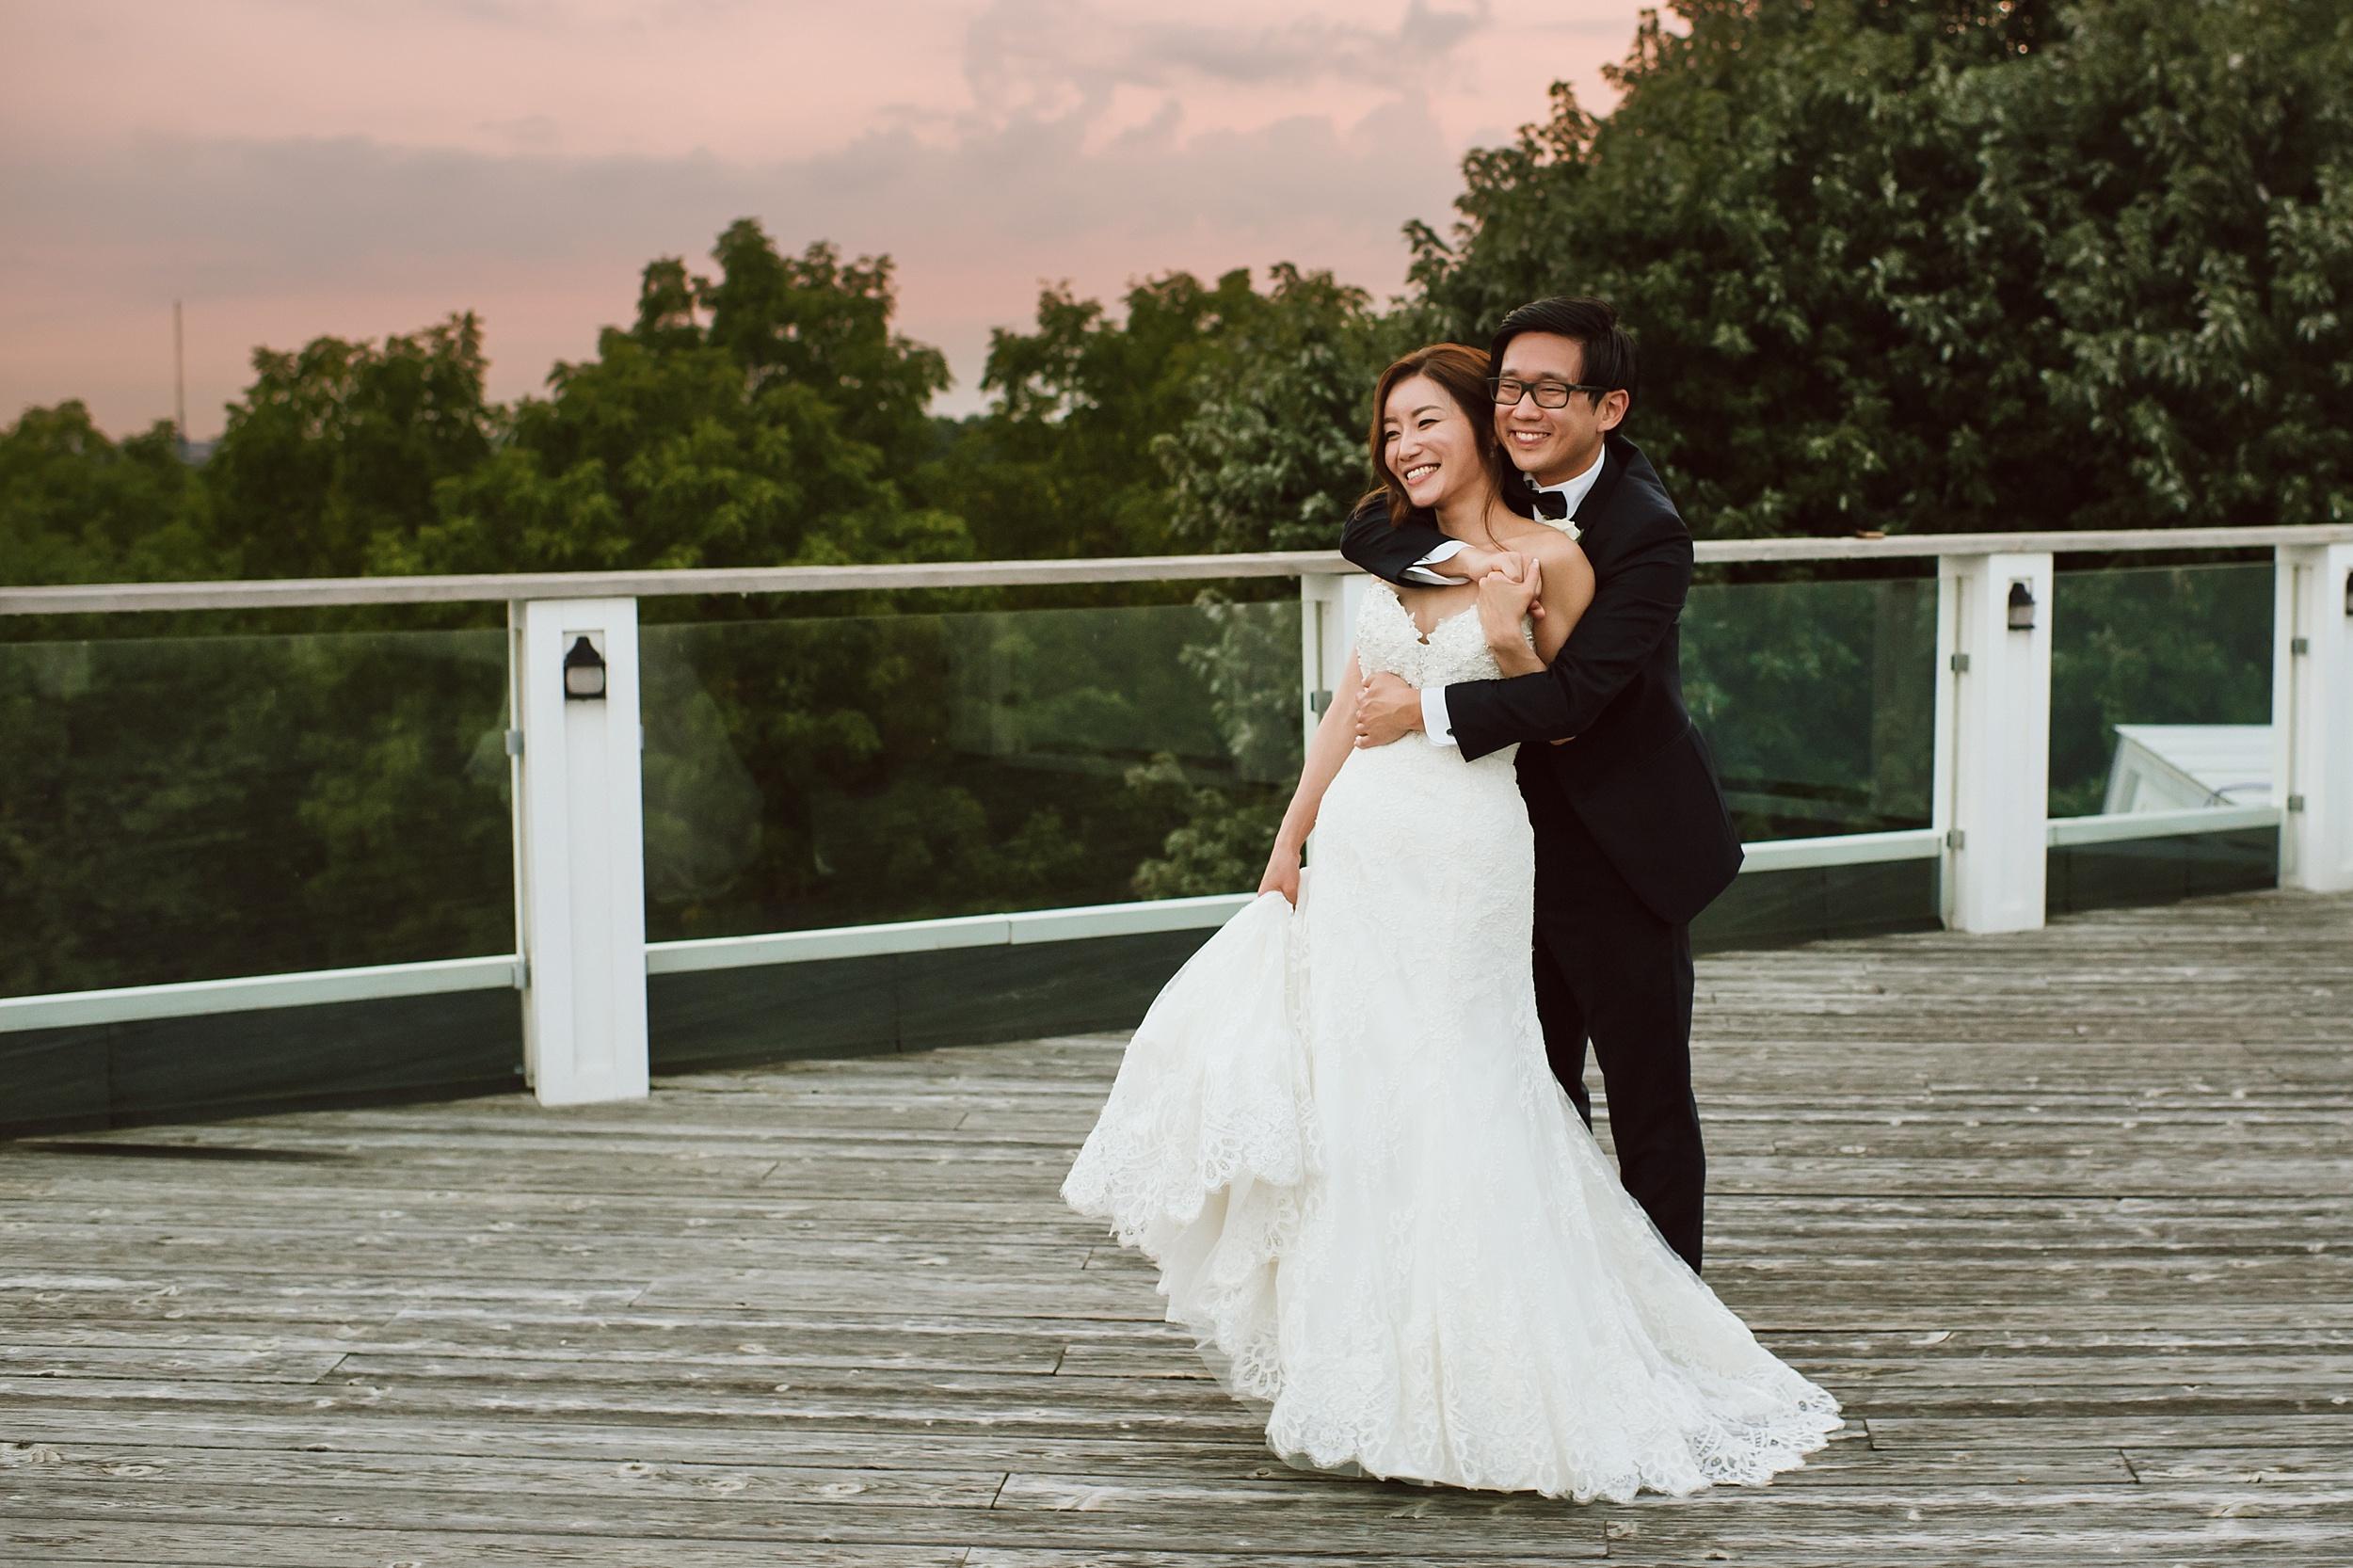 Doctors_House_Kleinburg_Wedding_Toronto_Photographer_0054.jpg